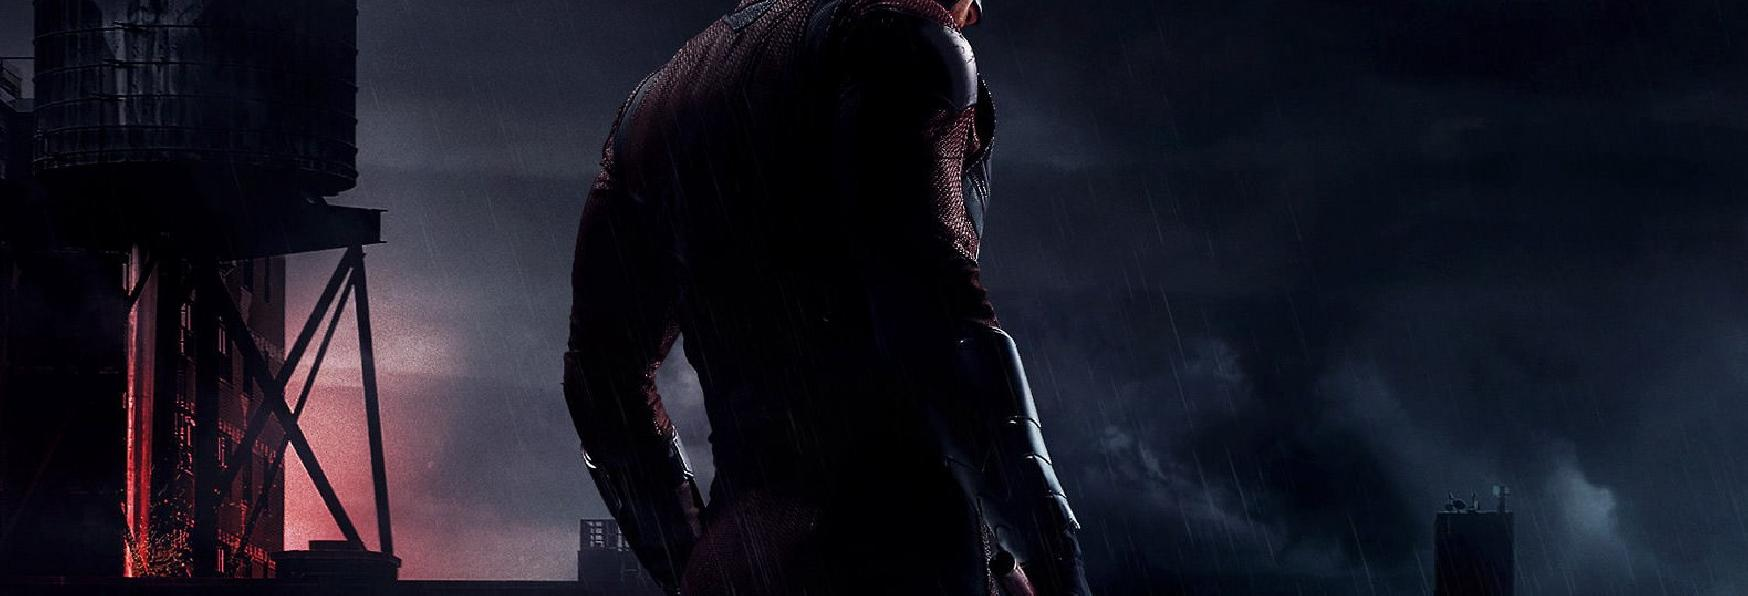 Netflix cancella Daredevil! Fan arrabbiatissimi